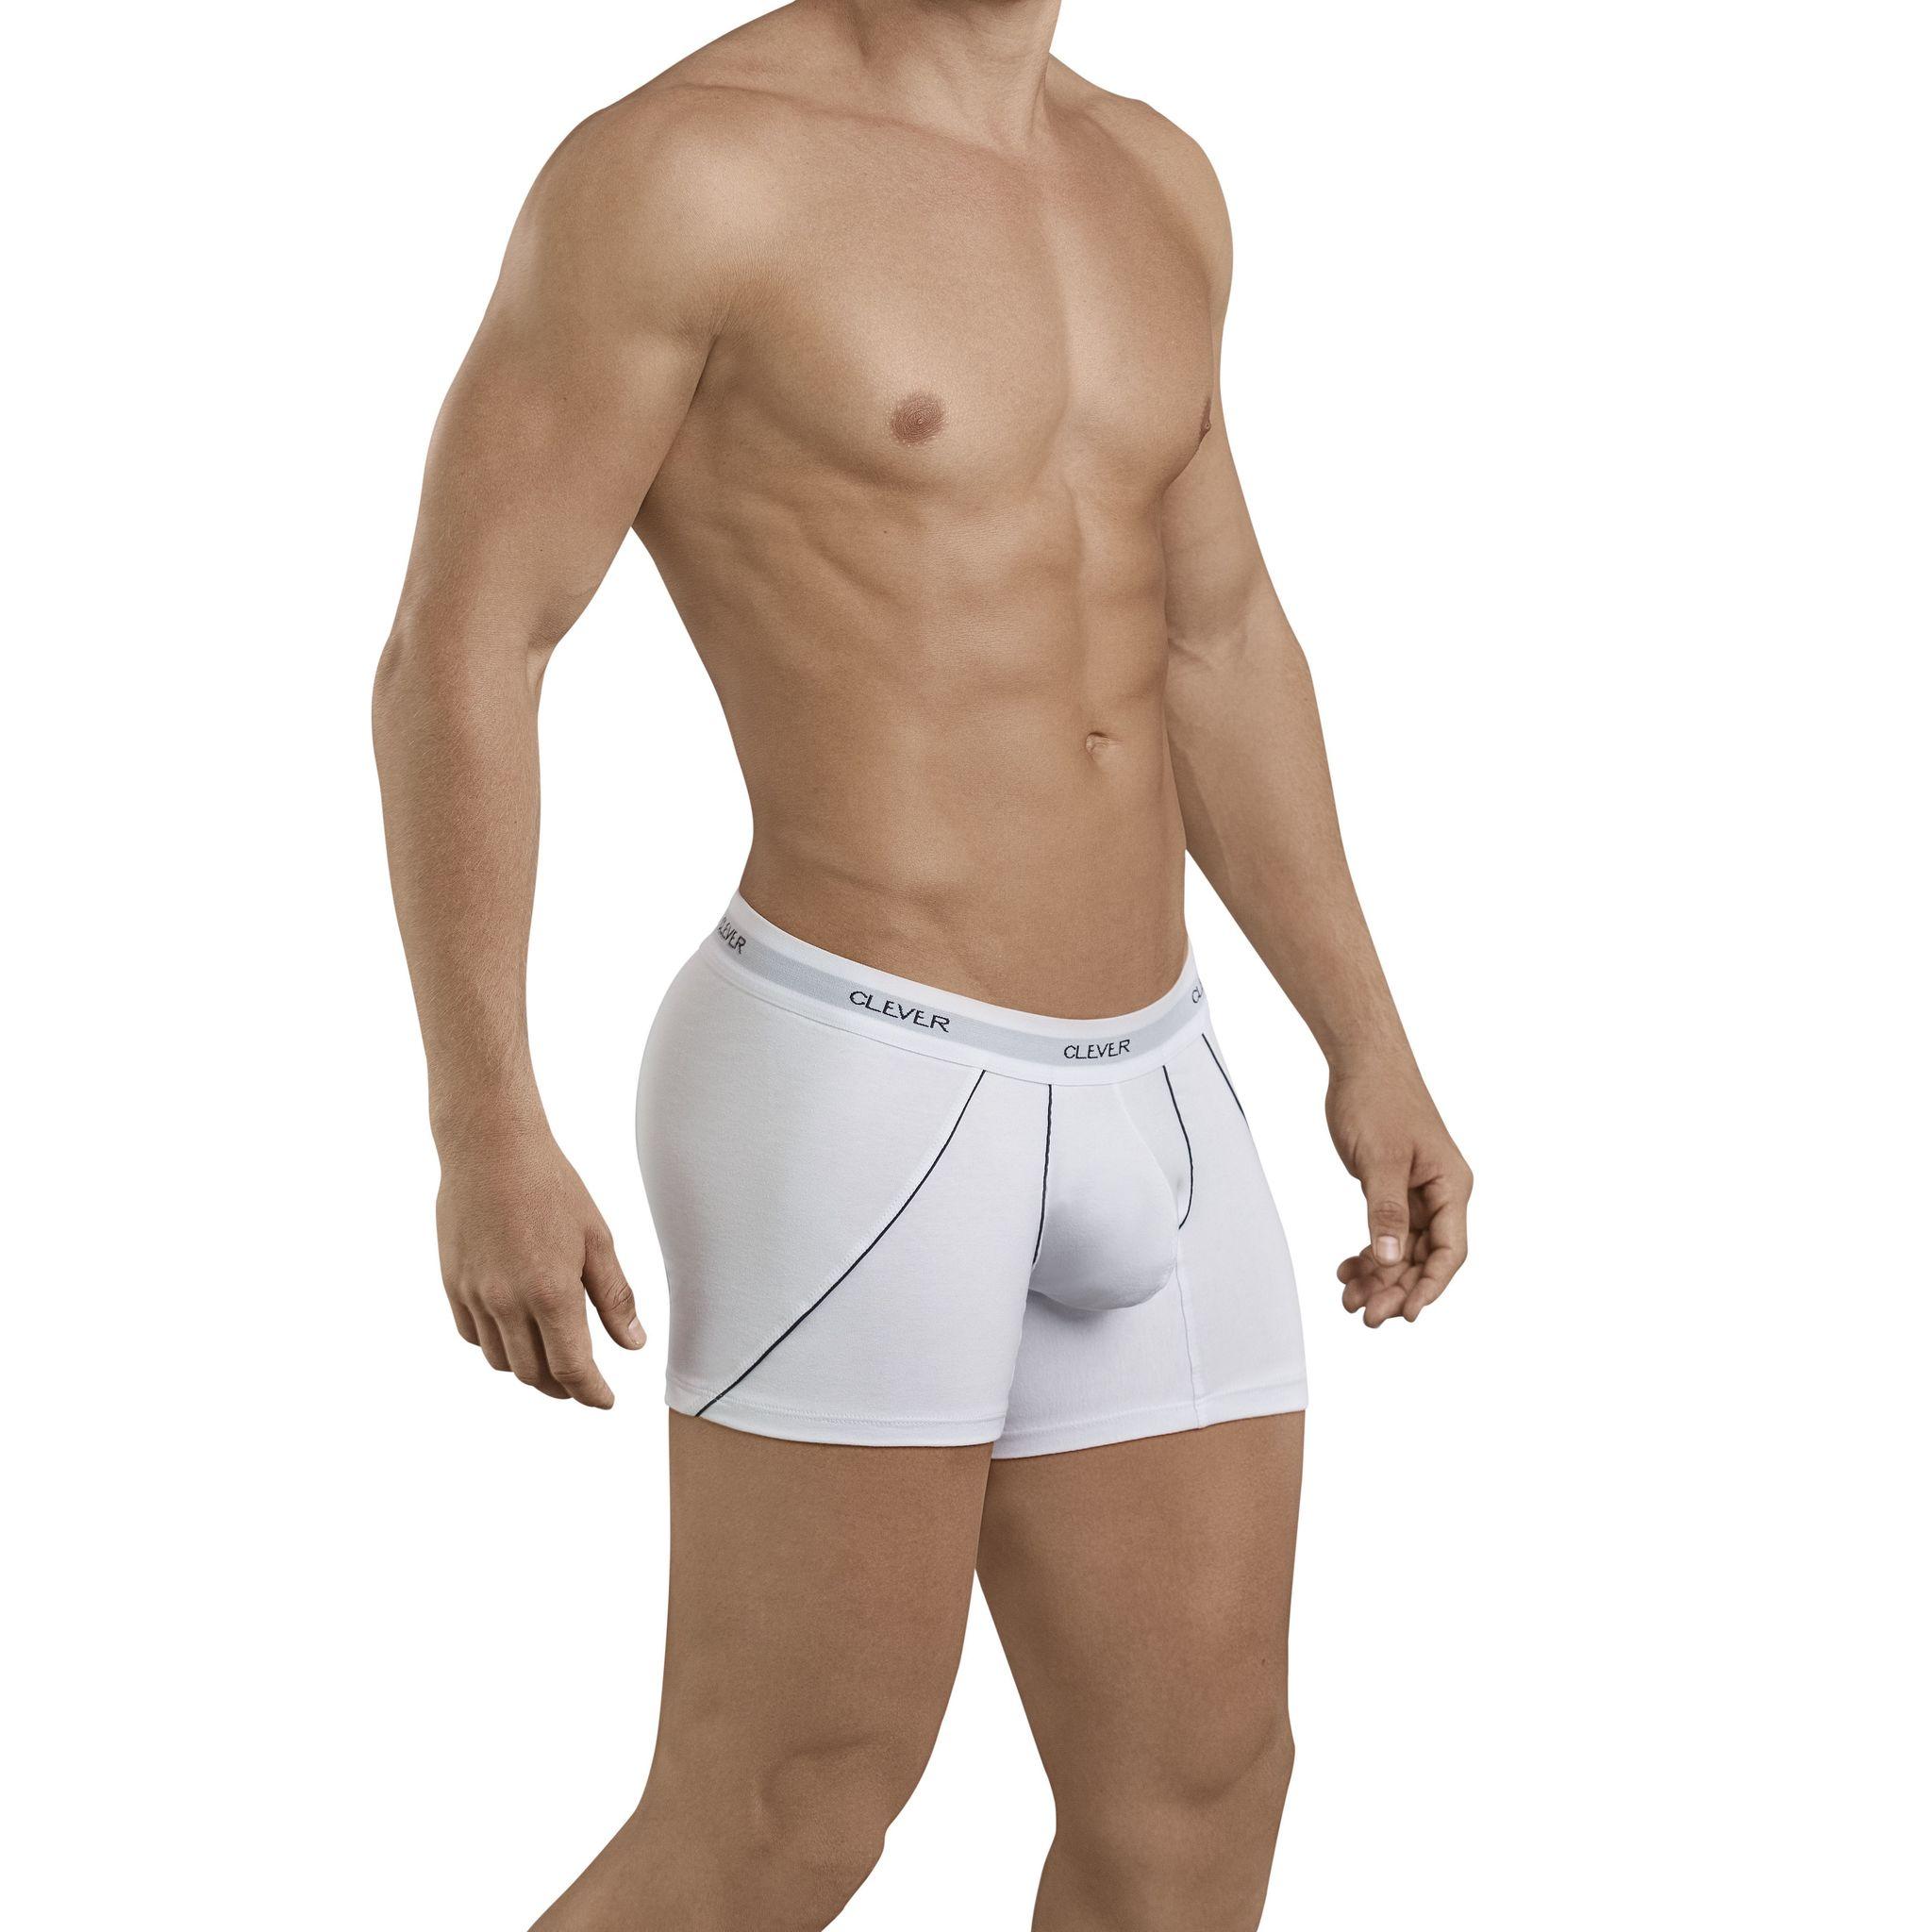 Мужские трусы боксеры белые Clever Stunning Boxer 239901